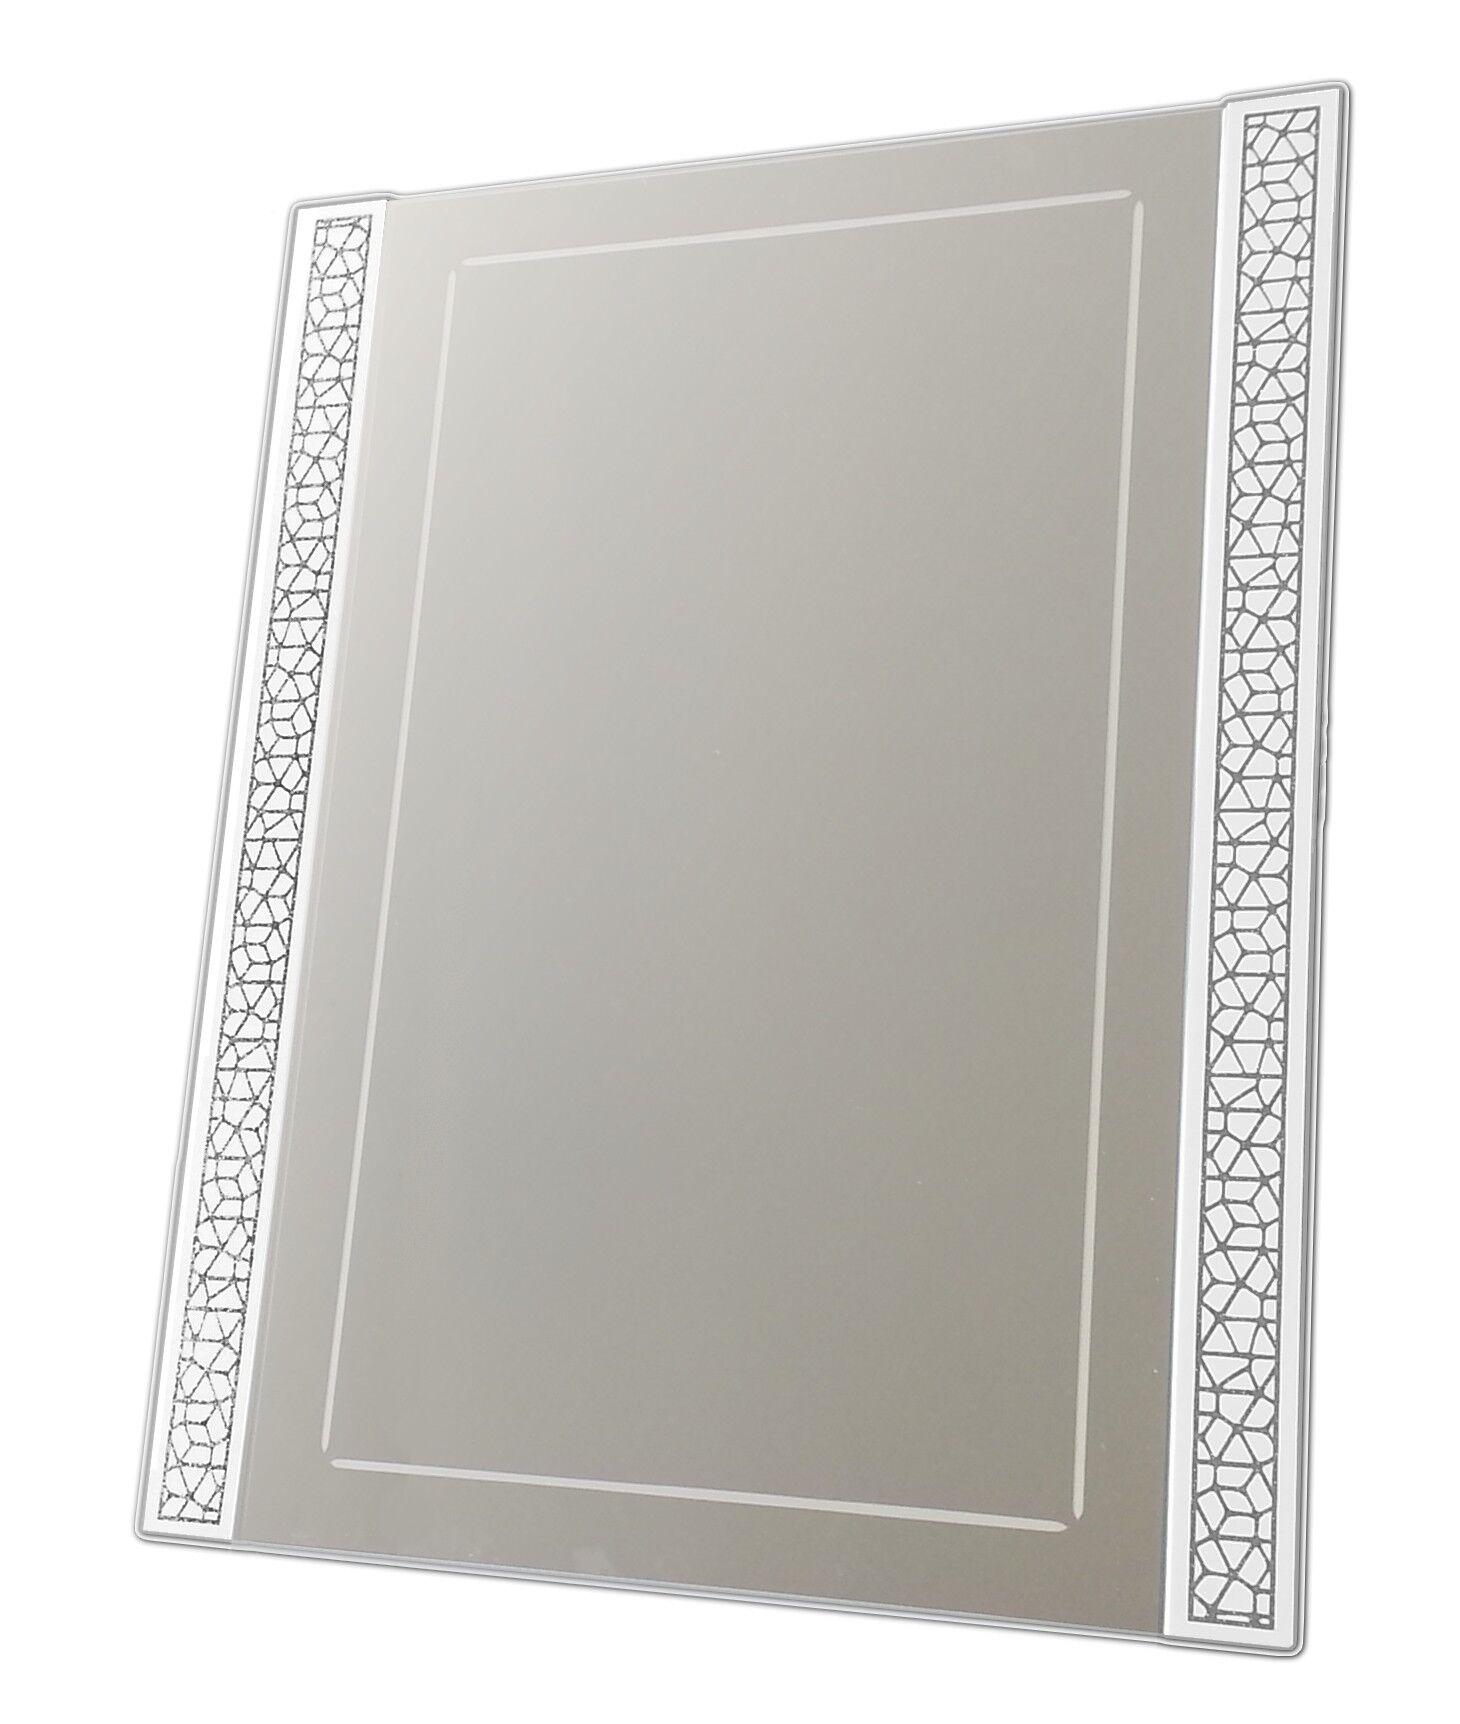 gdegdesign Miroir design blanc rectangulaire à motifs brillants - Steed